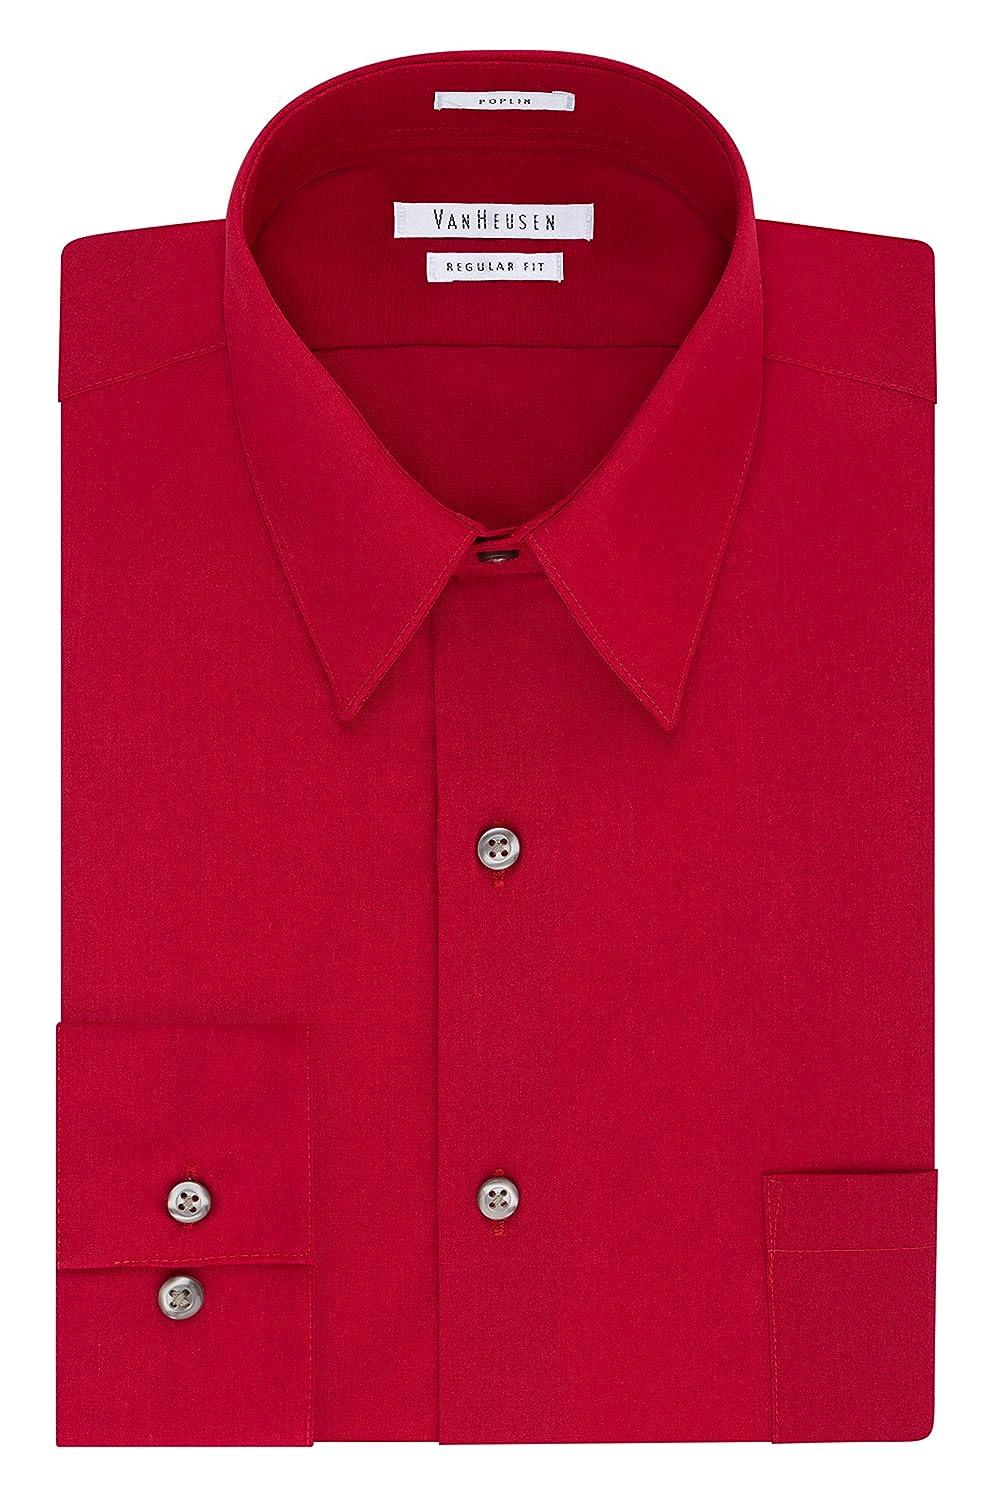 Van Heusen Men's Dress Shirt Regular Fit Poplin Solid